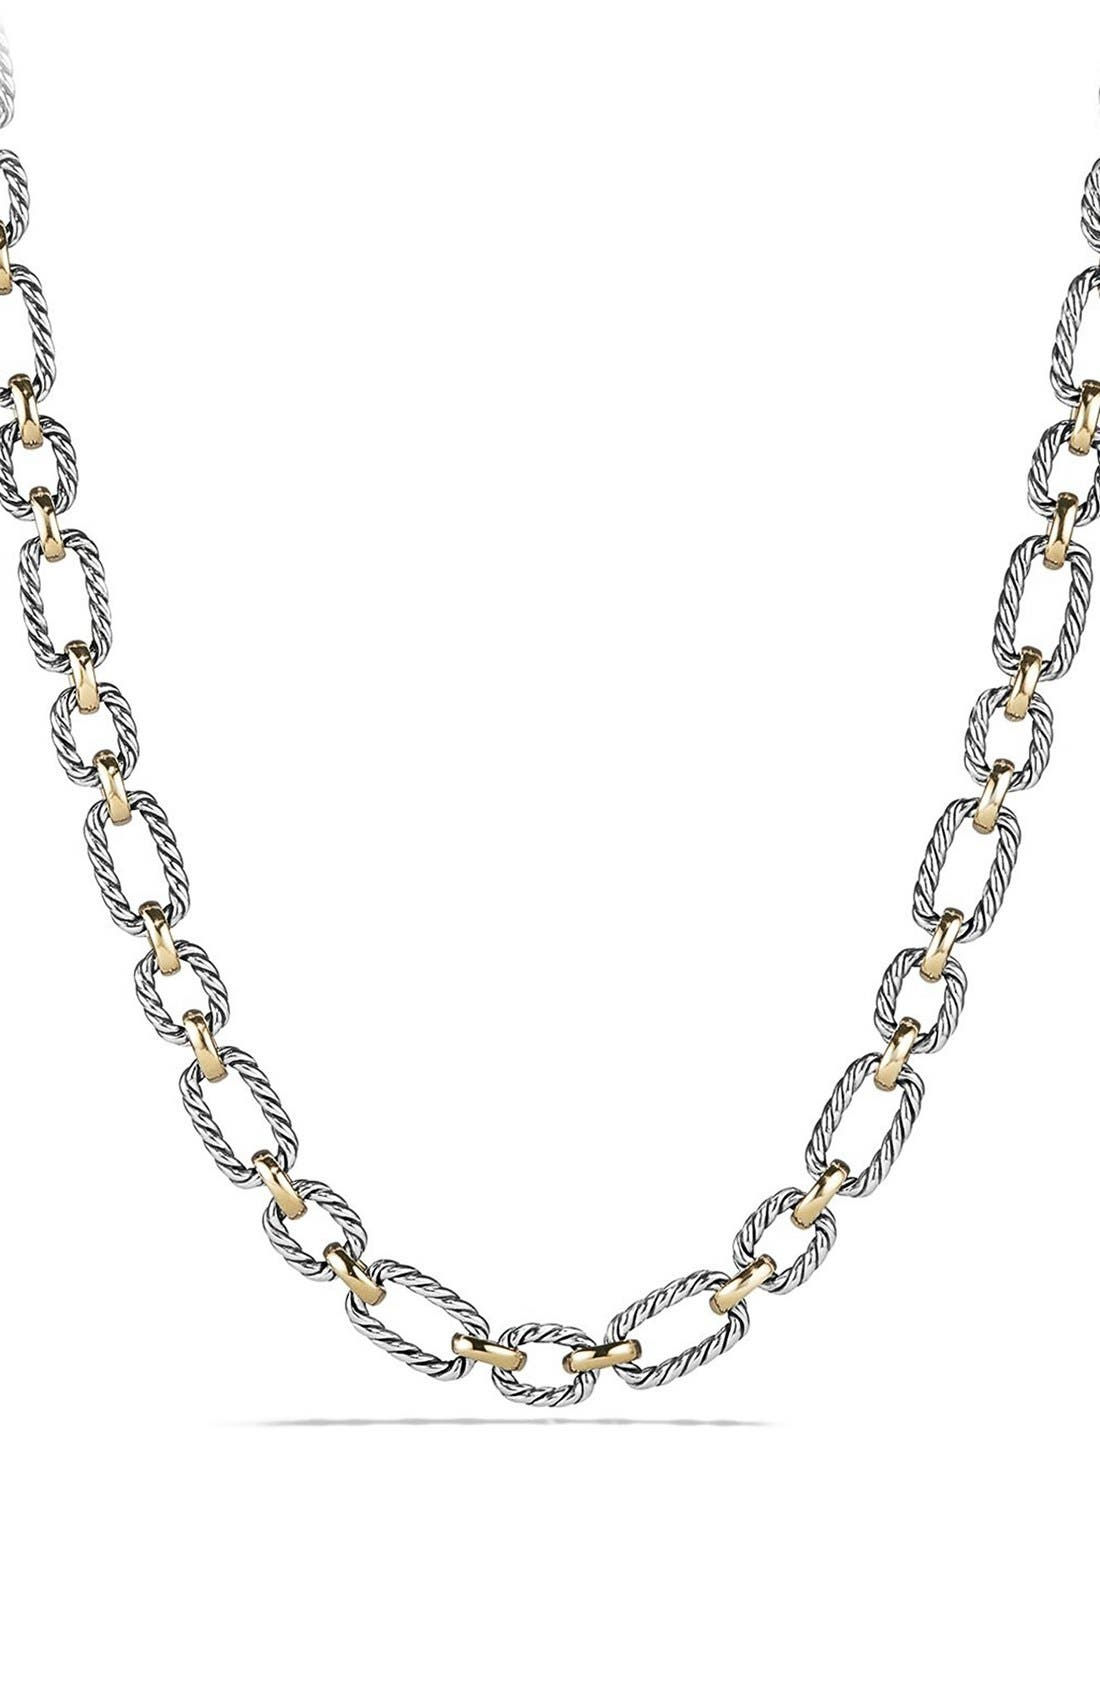 DAVID YURMAN 'Chain' Cushion Link Necklace with Sapphires